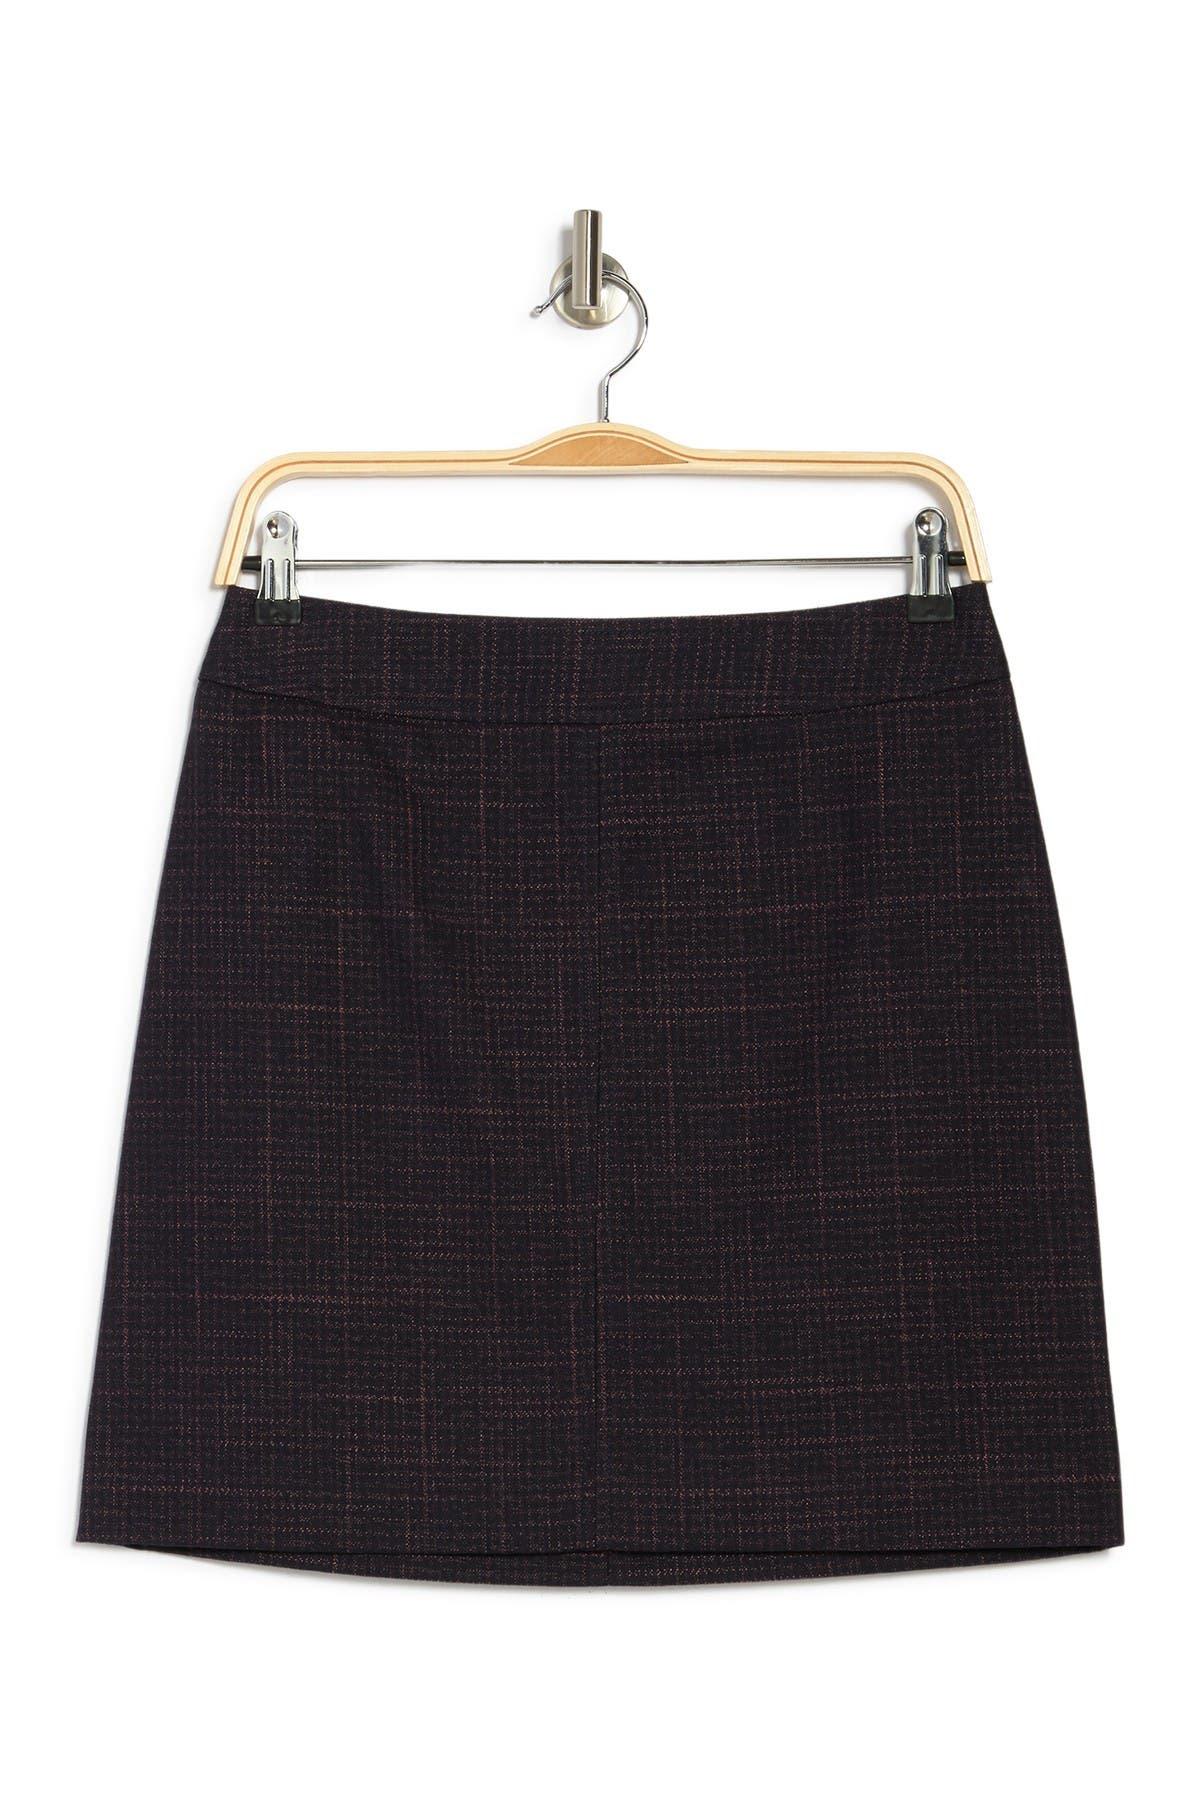 Image of See By Chloe Plaid Mini Skirt